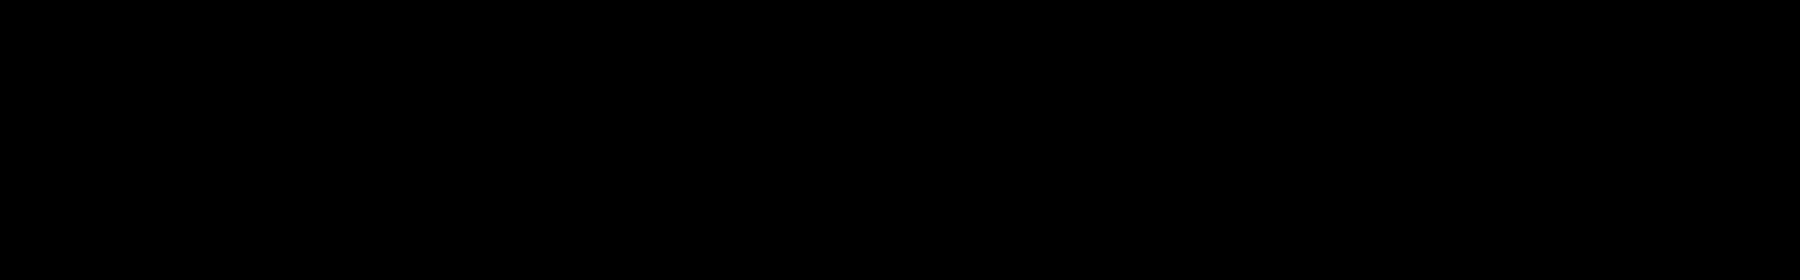 Dubstep Foundations audio waveform